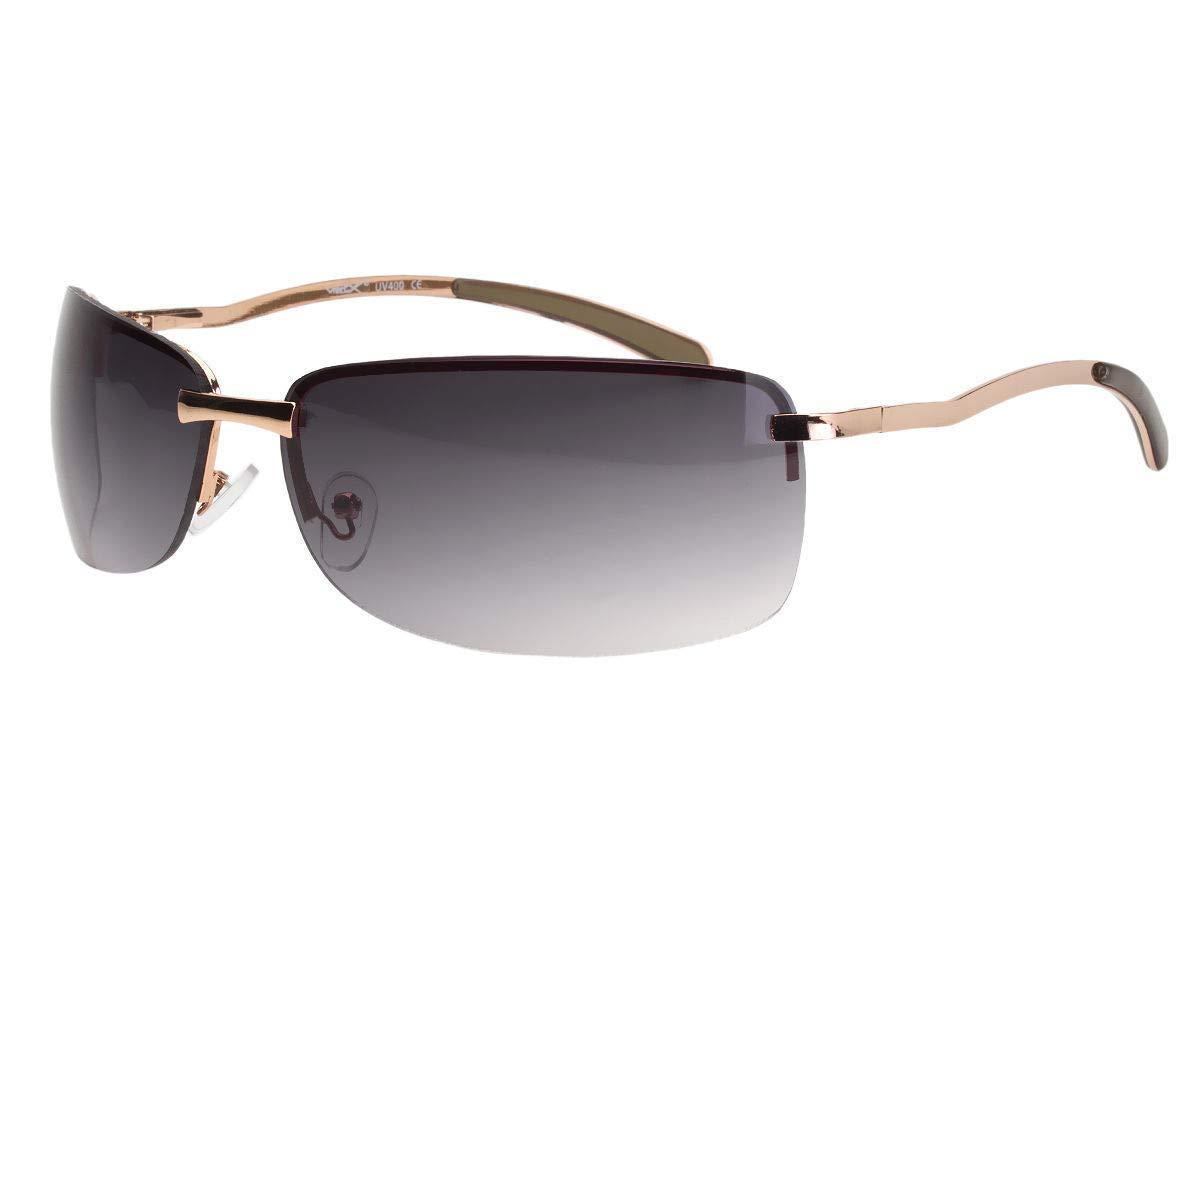 7092185e31c9 Classic Retro Mens Fashion Rectangle Metal Aviator Vintage Designer  Sunglasses Sunglasses   Sunglasses Accessories